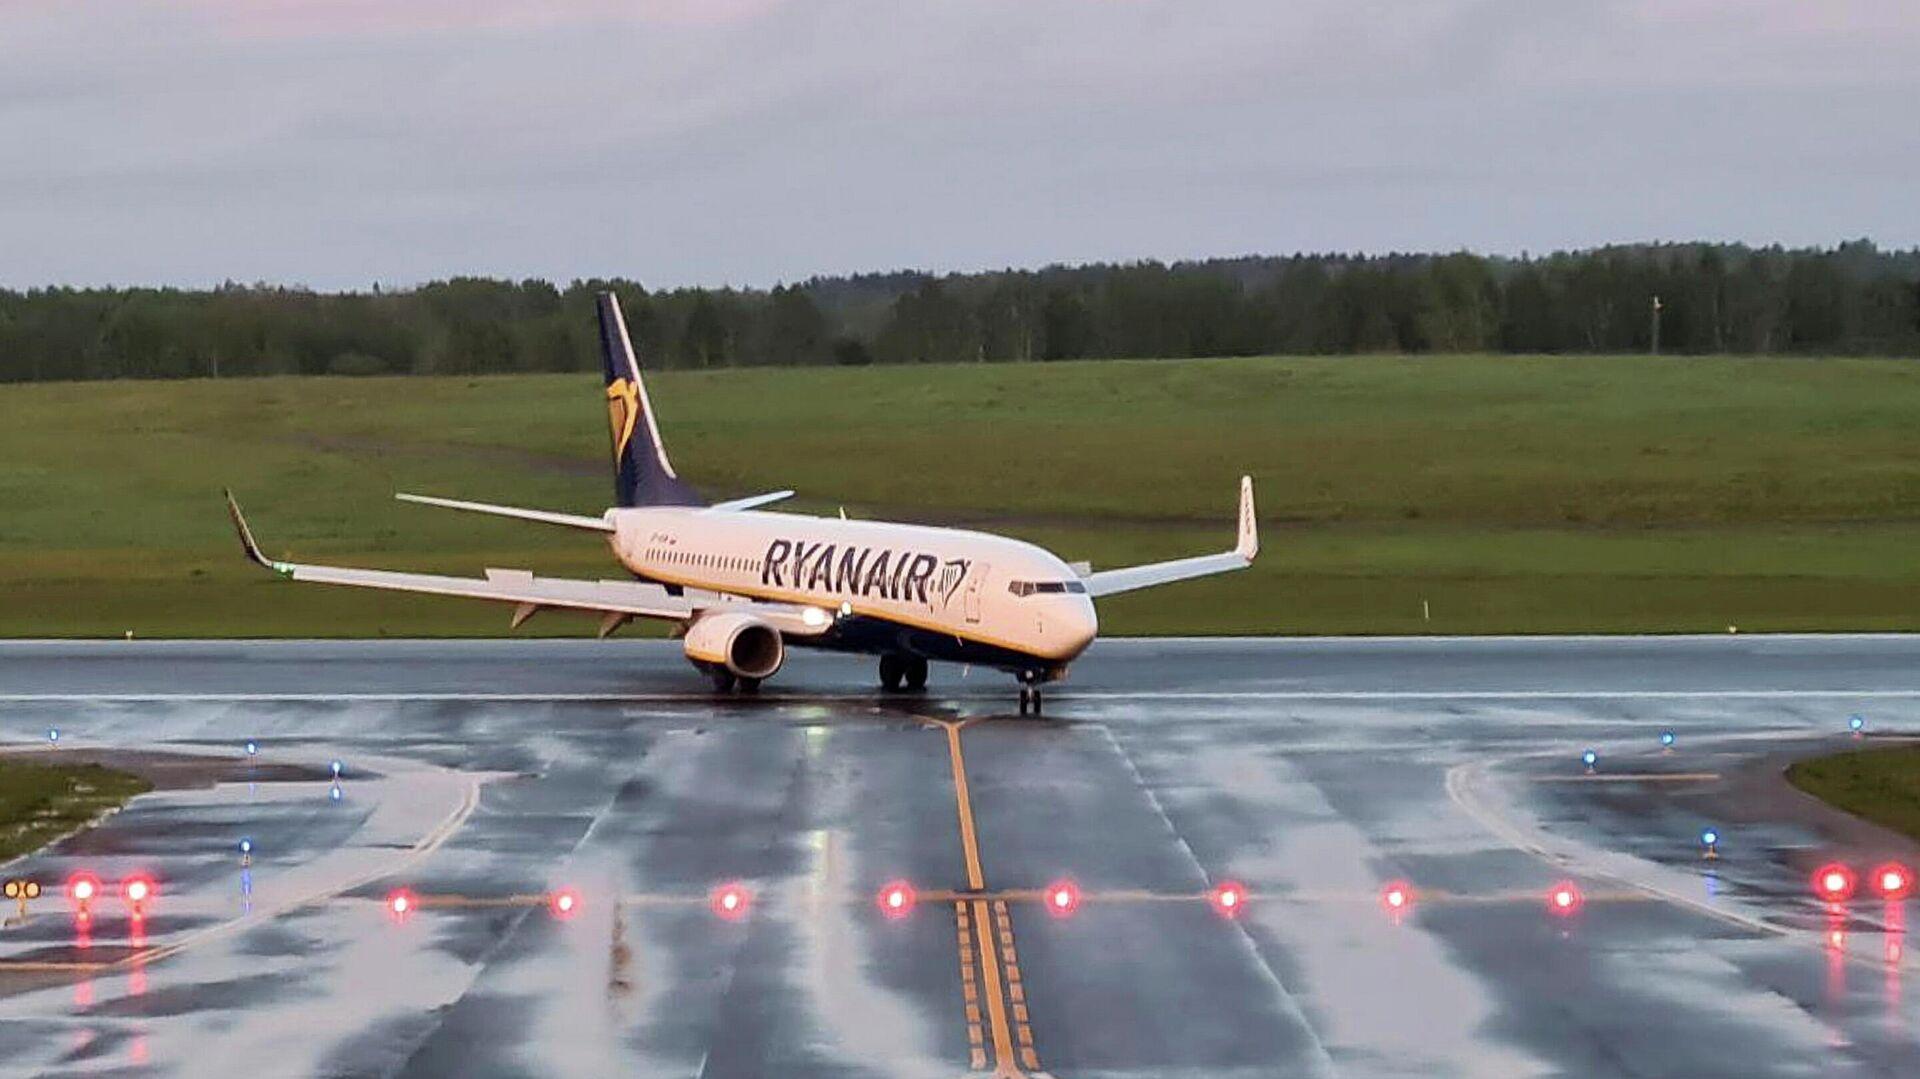 Самолет авиакомпании Ryanair, на котором находился Роман Протасевич, в аэропорту Вильнюса - РИА Новости, 1920, 26.05.2021